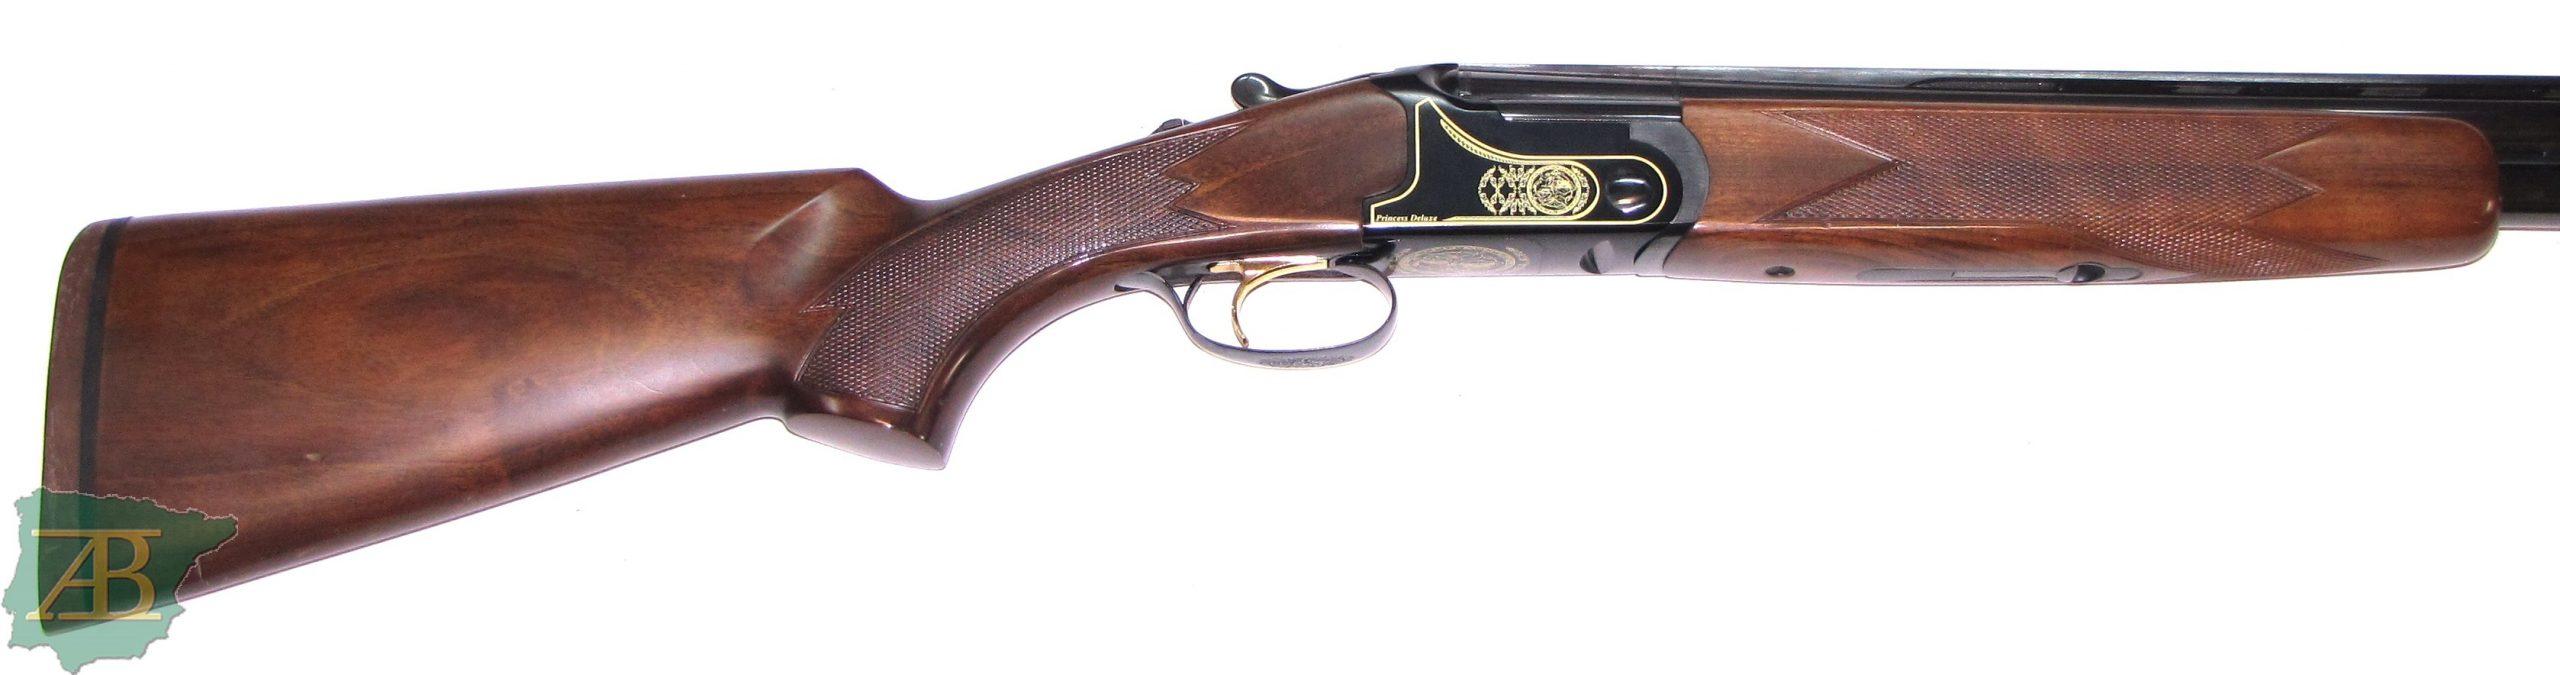 Escopeta superpuesta de caza LANBER PRINCESS DELUXE Ref 5520-armeriaiberica-2